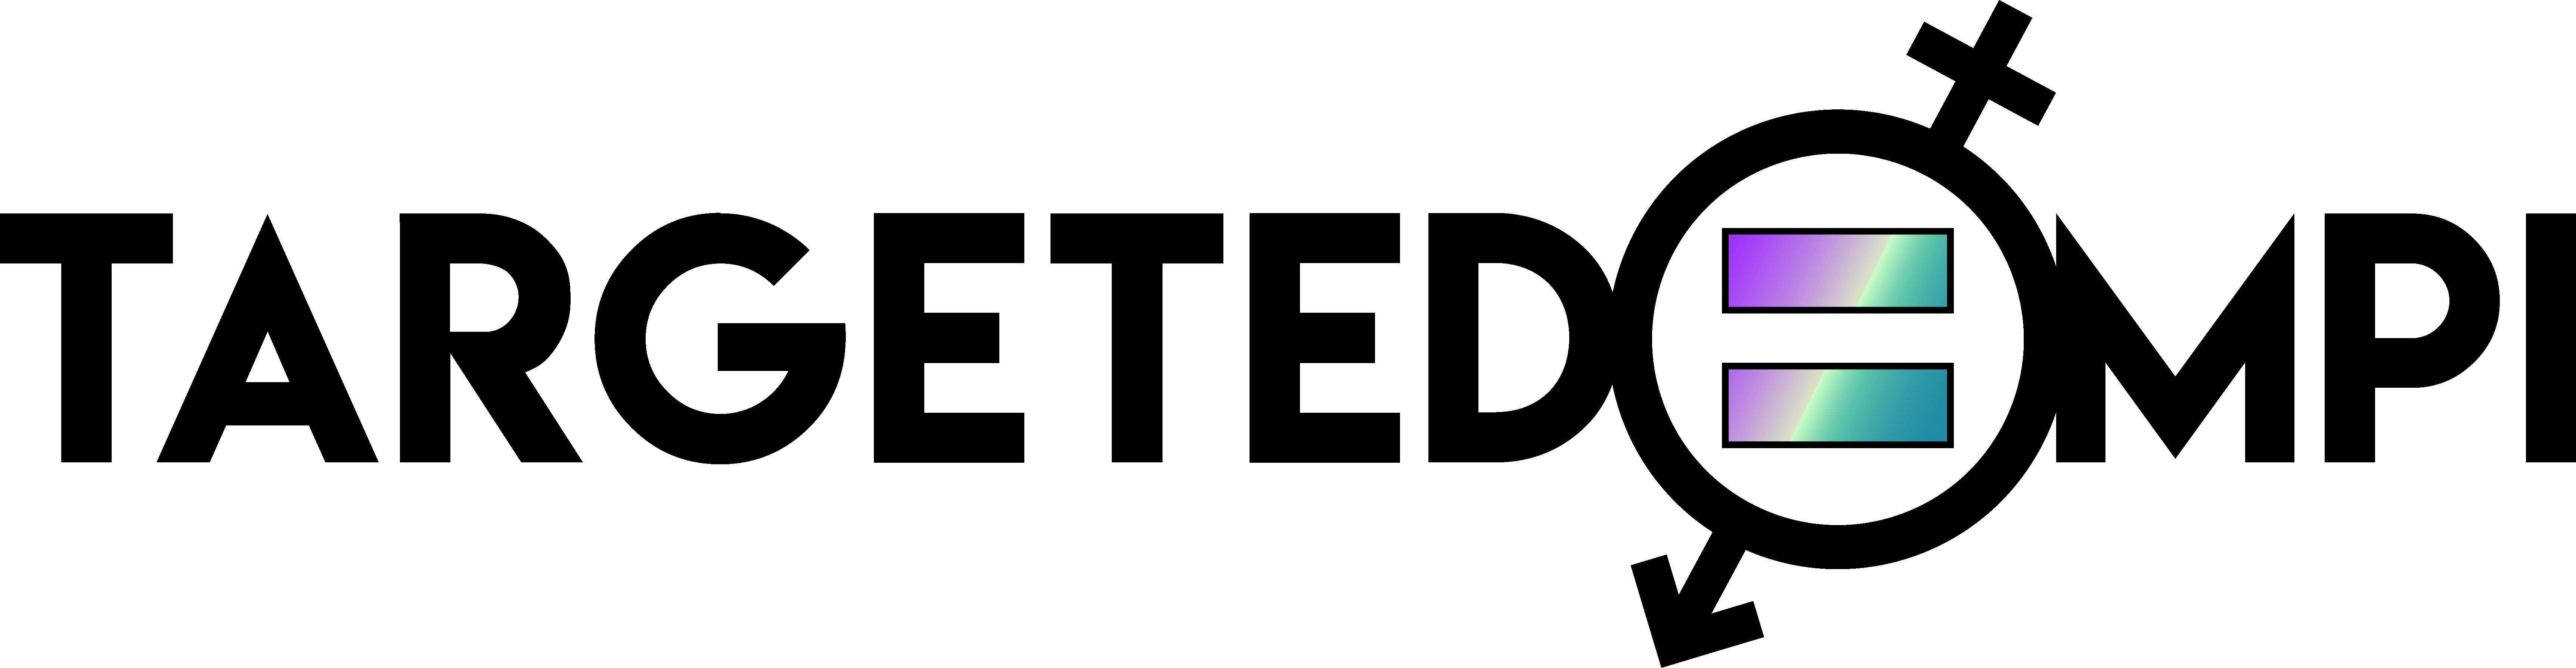 TARGETED-MPI_Logo_Light@300x-1